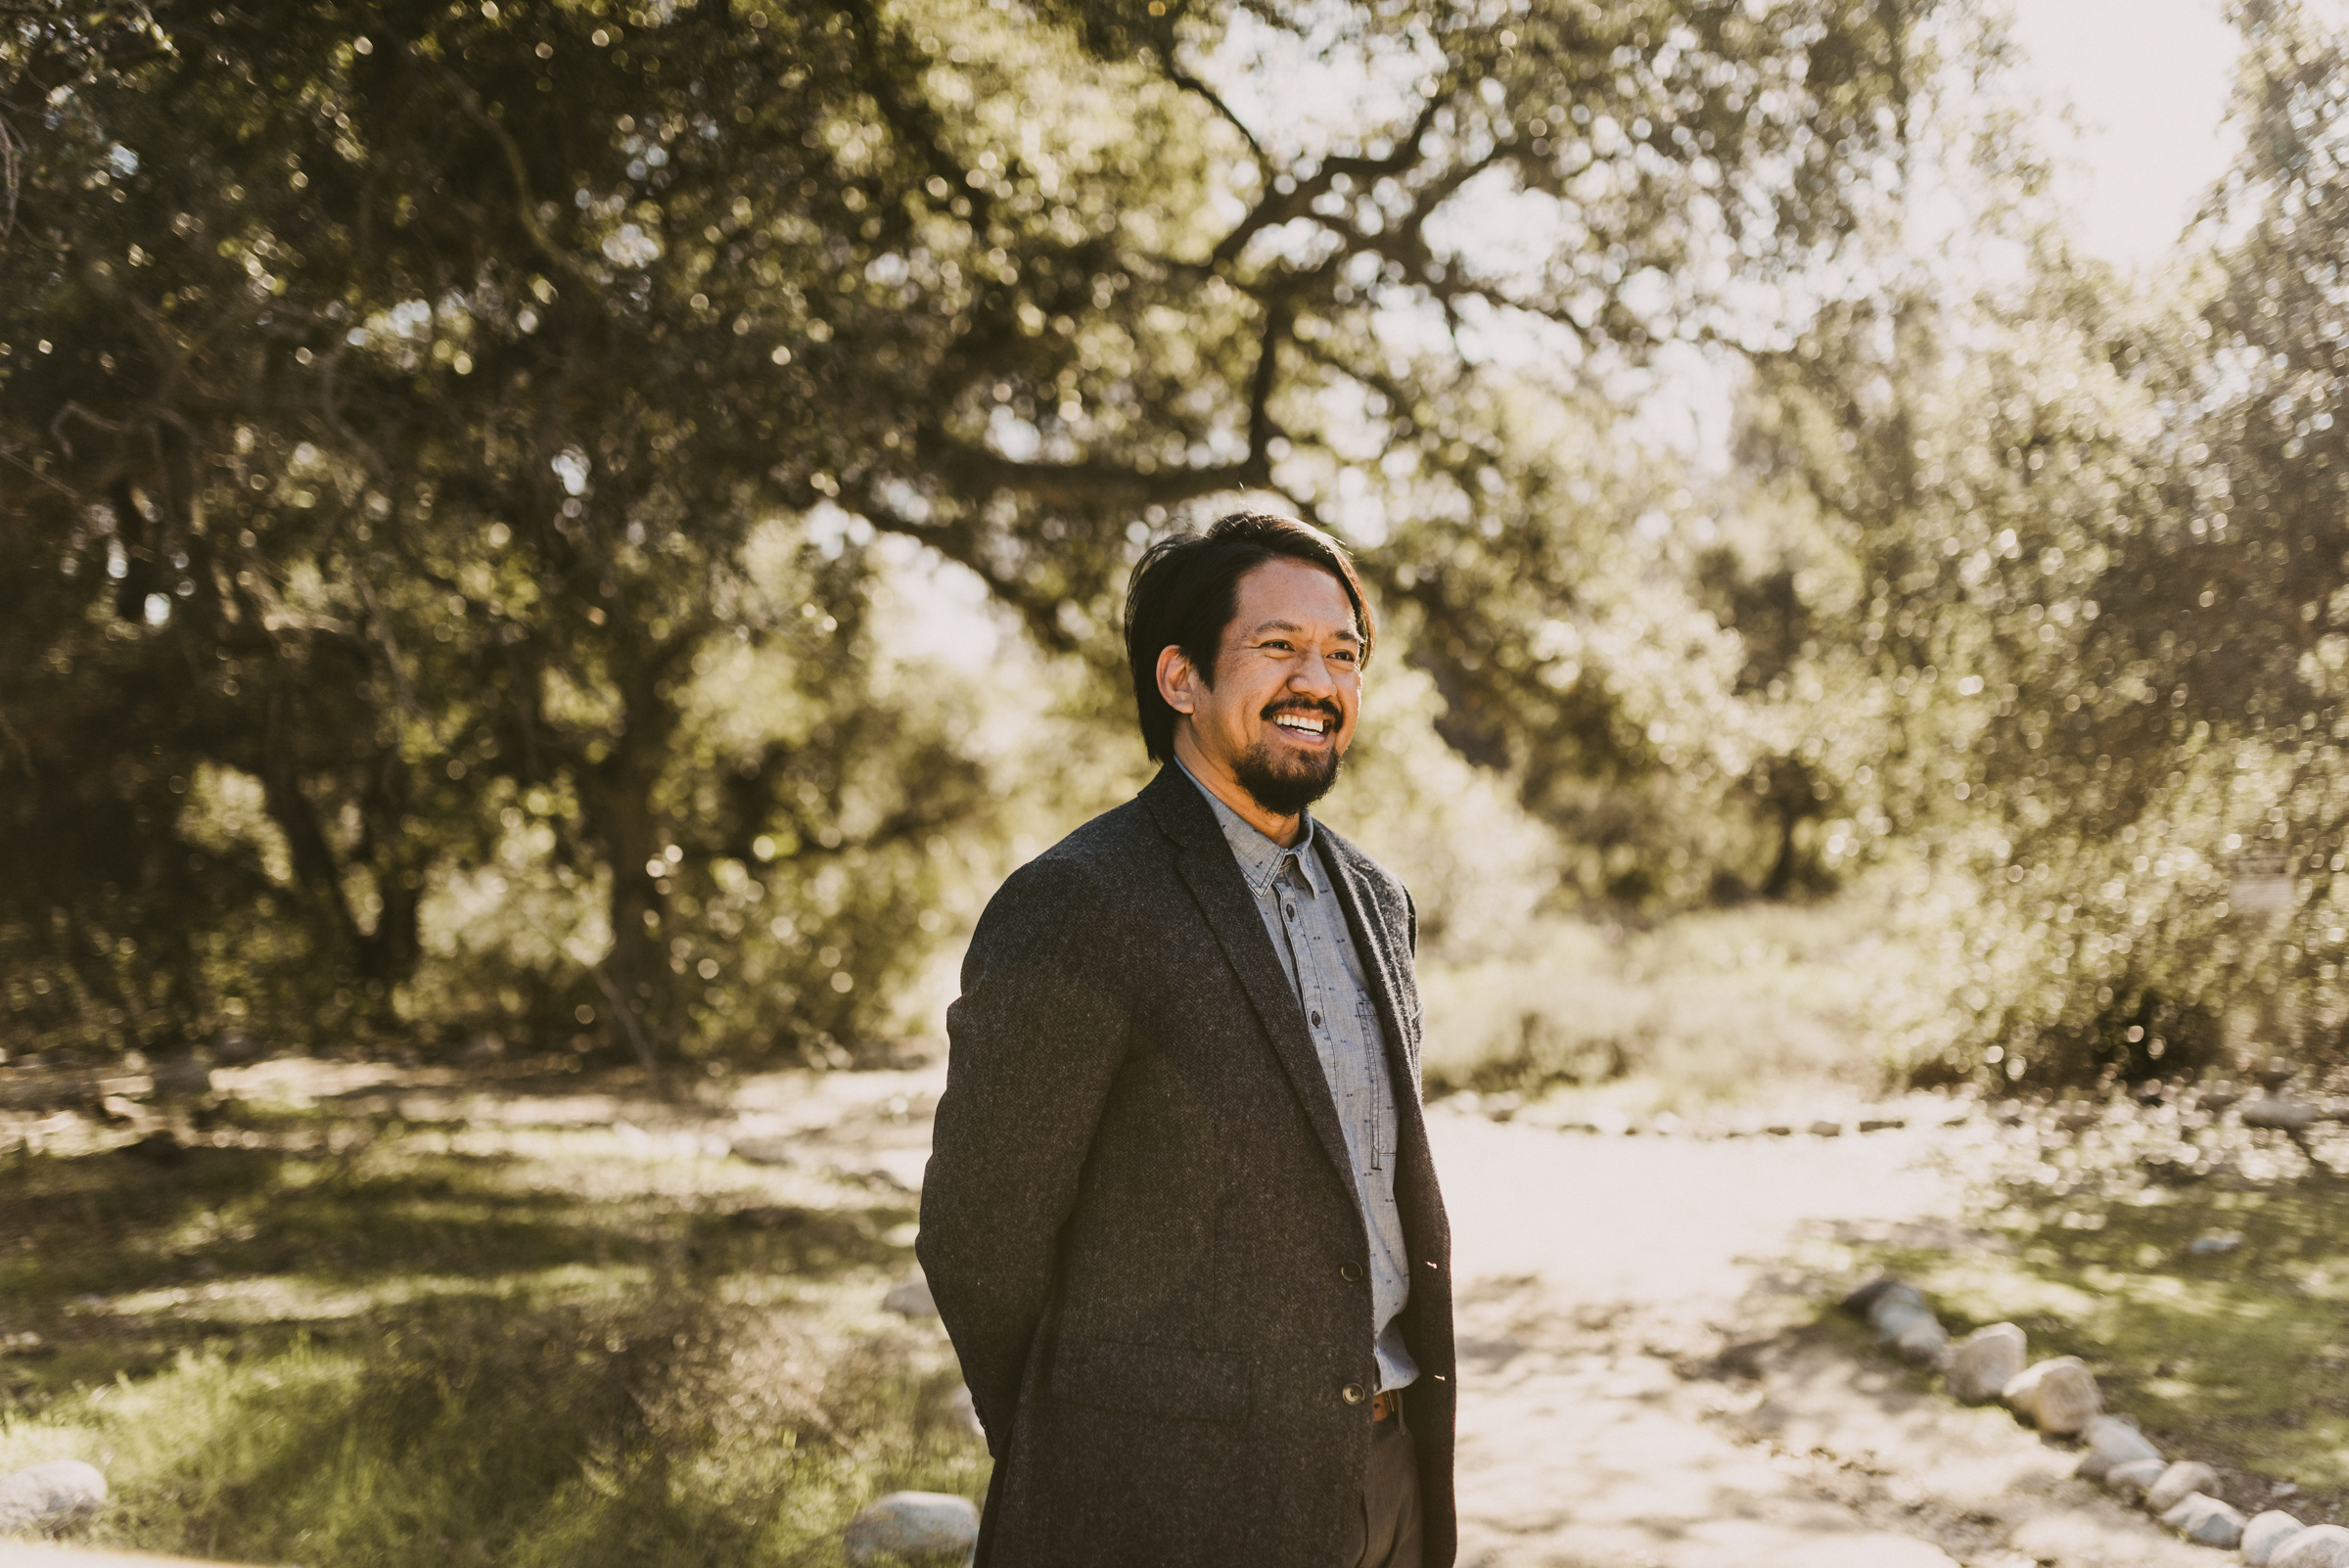 ©Isaiah + Taylor Photography - Intimate Elopement, Eaton Canyon, Los Angeles Wedding Photographer-6.jpg